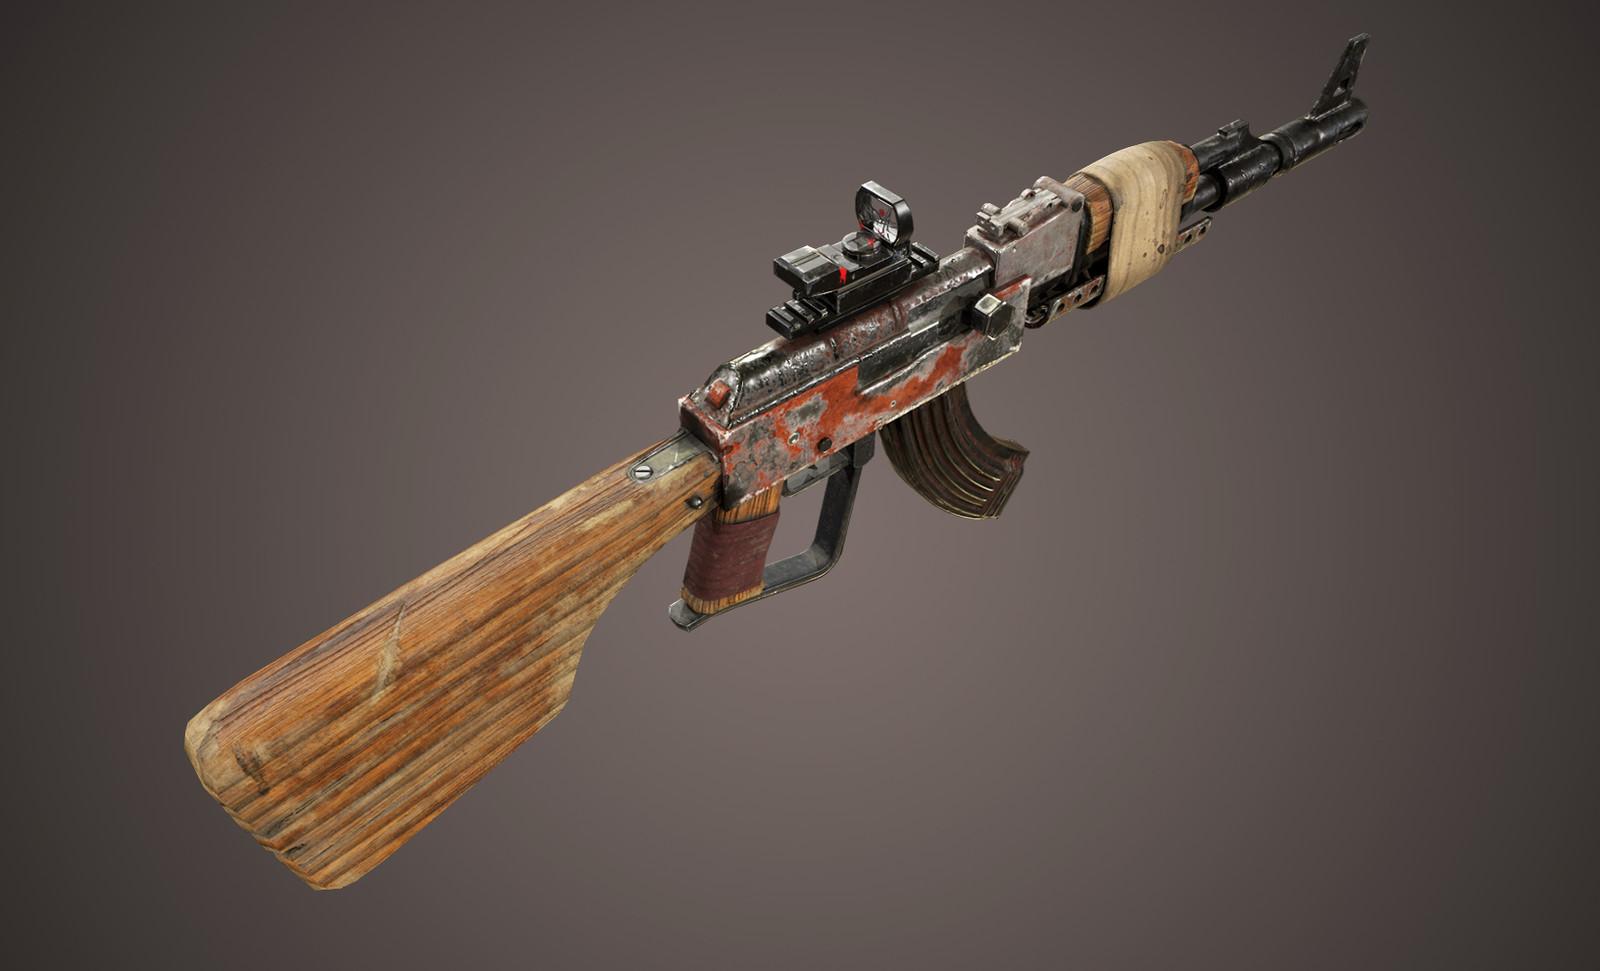 Post-Apocalypse AK - 47